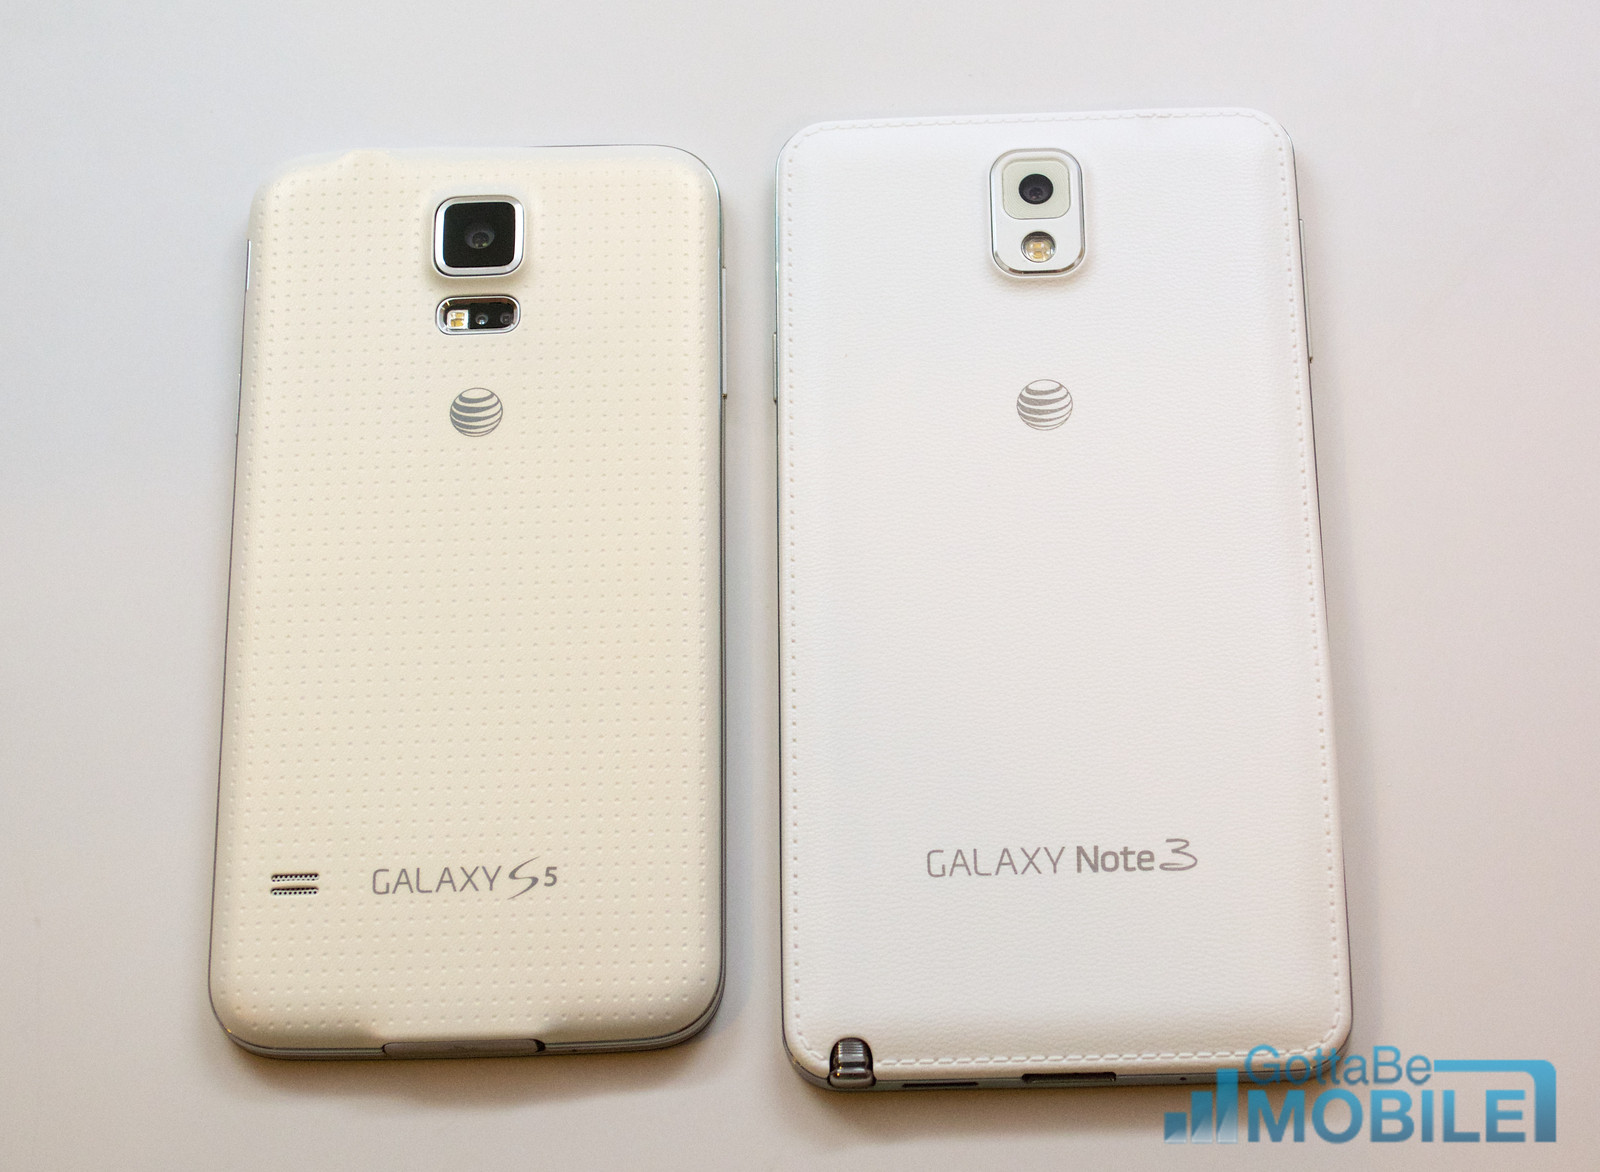 samsung galaxy s5 vs galaxy note 3 video  buyer u0026 39 s guide